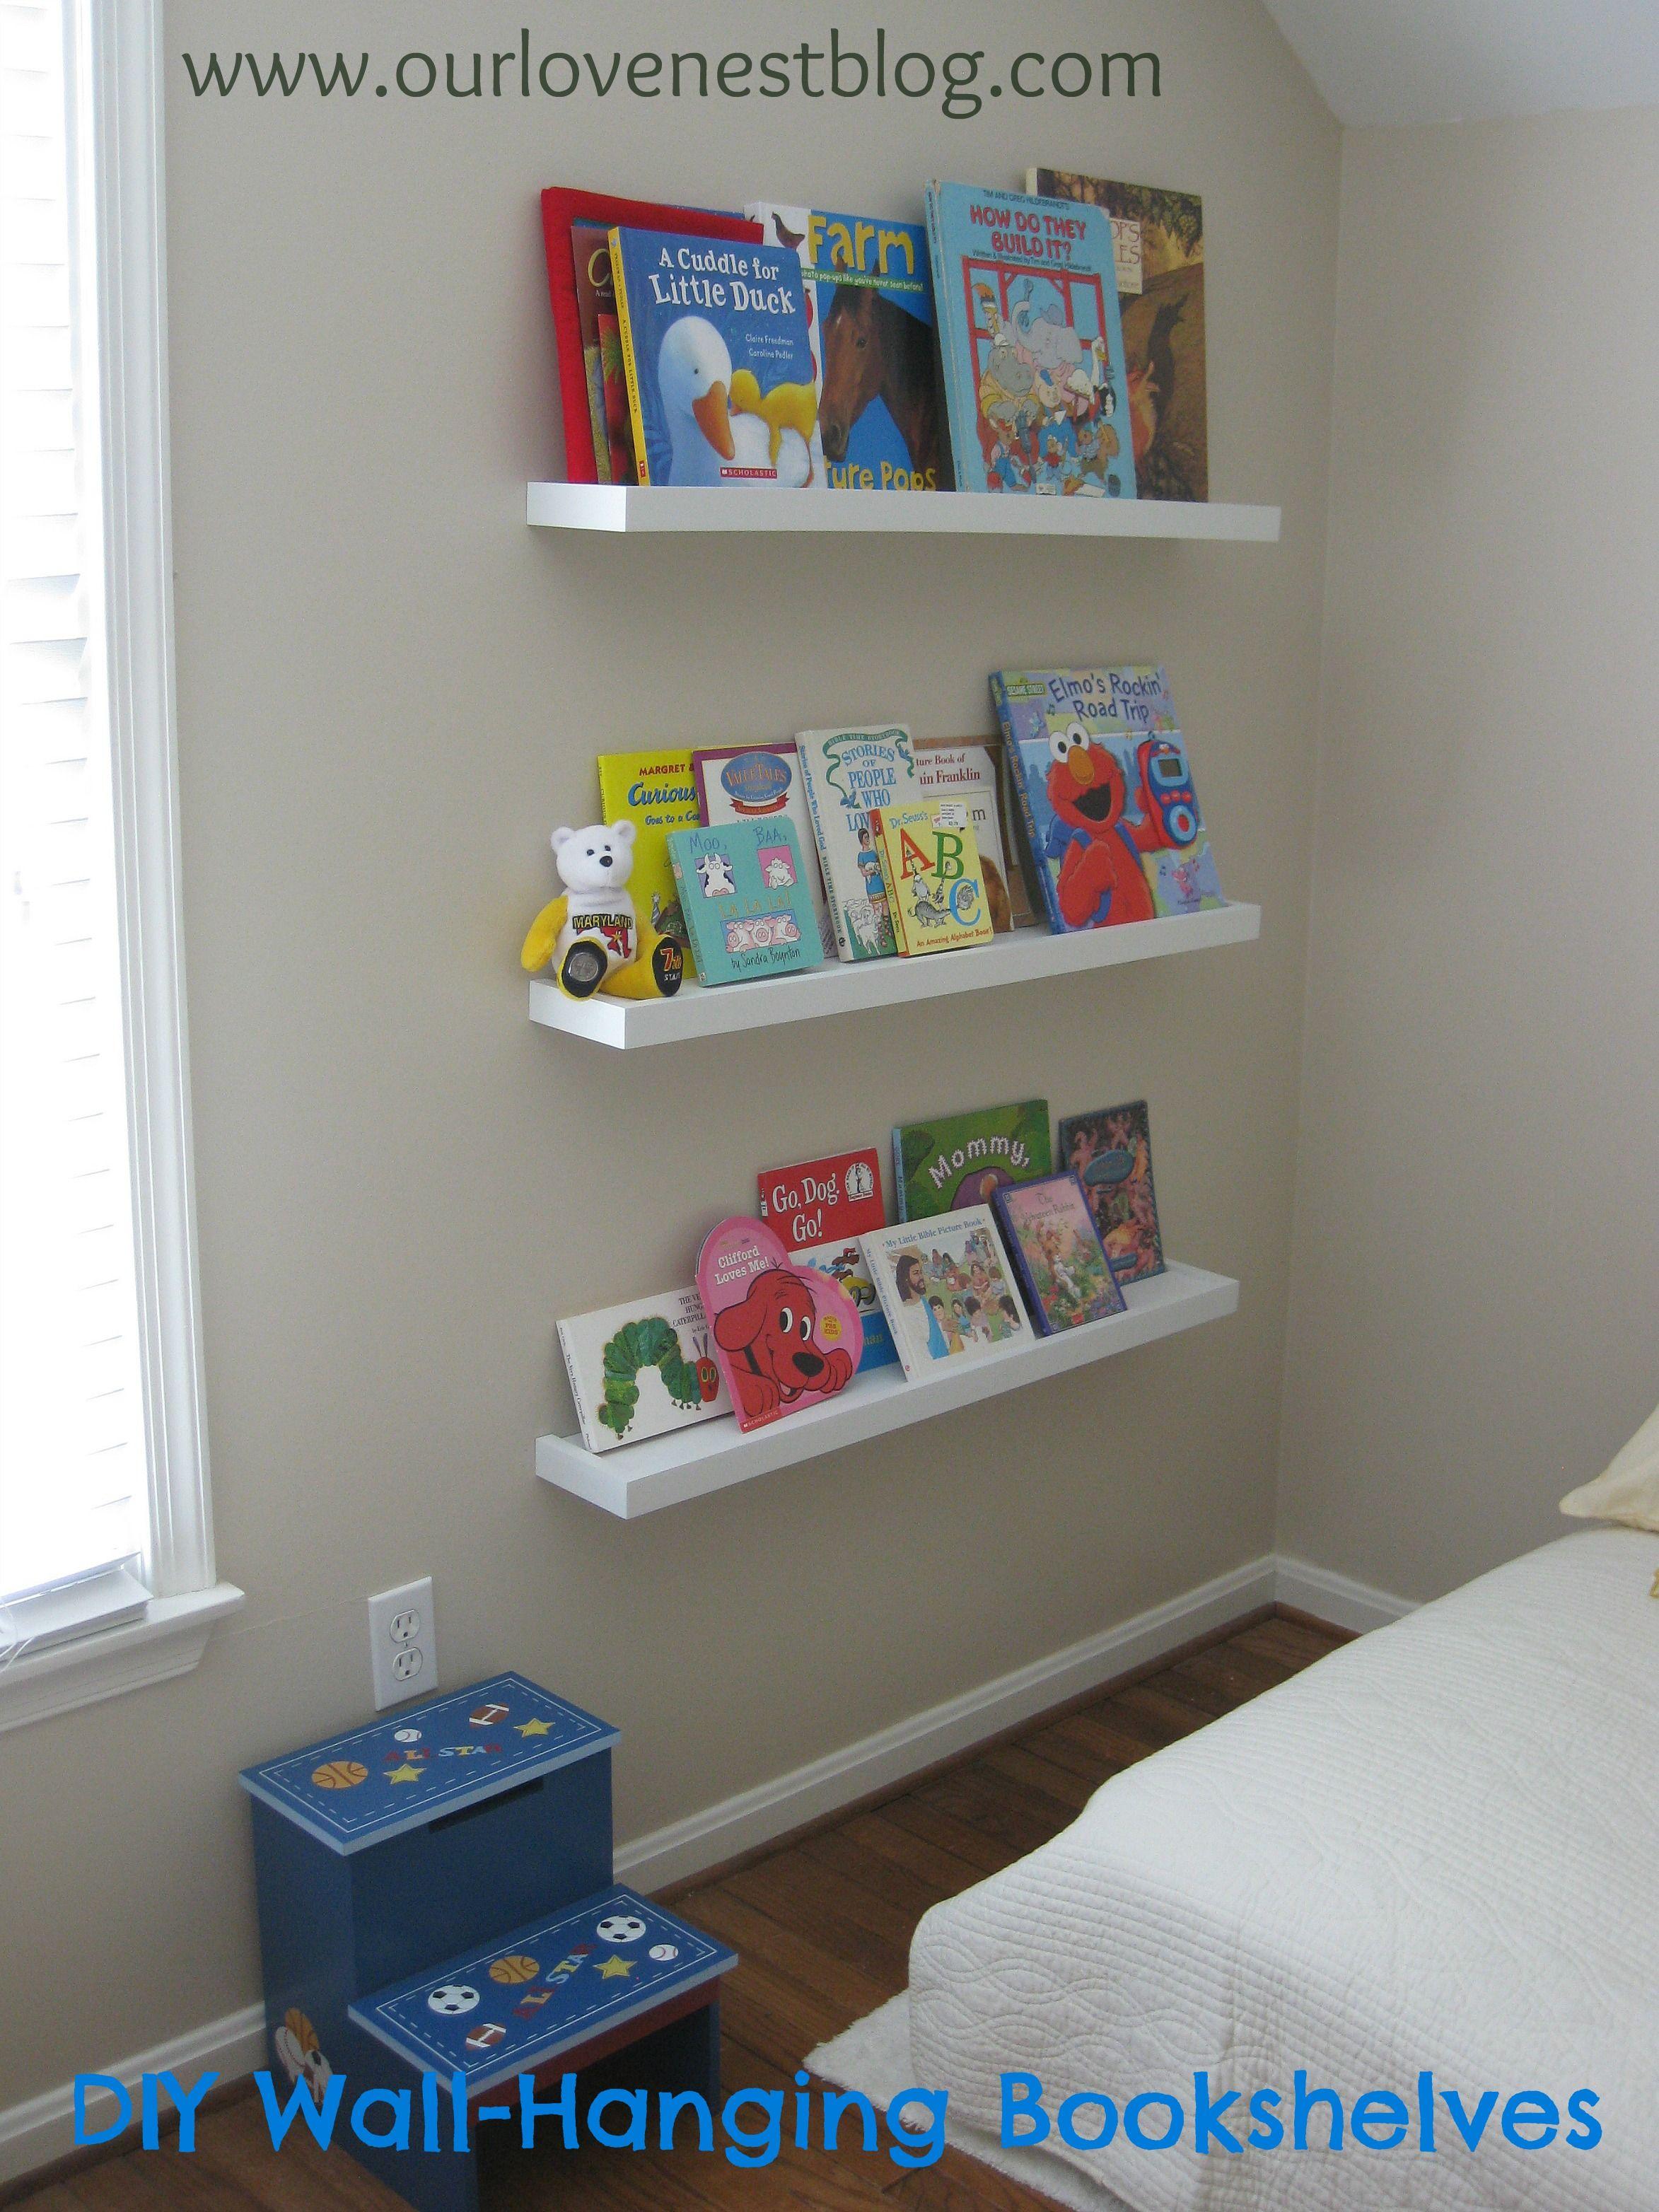 diy wall hung childrens bookshelves wwwourlovenestblogcom - Childrens Bookshelves